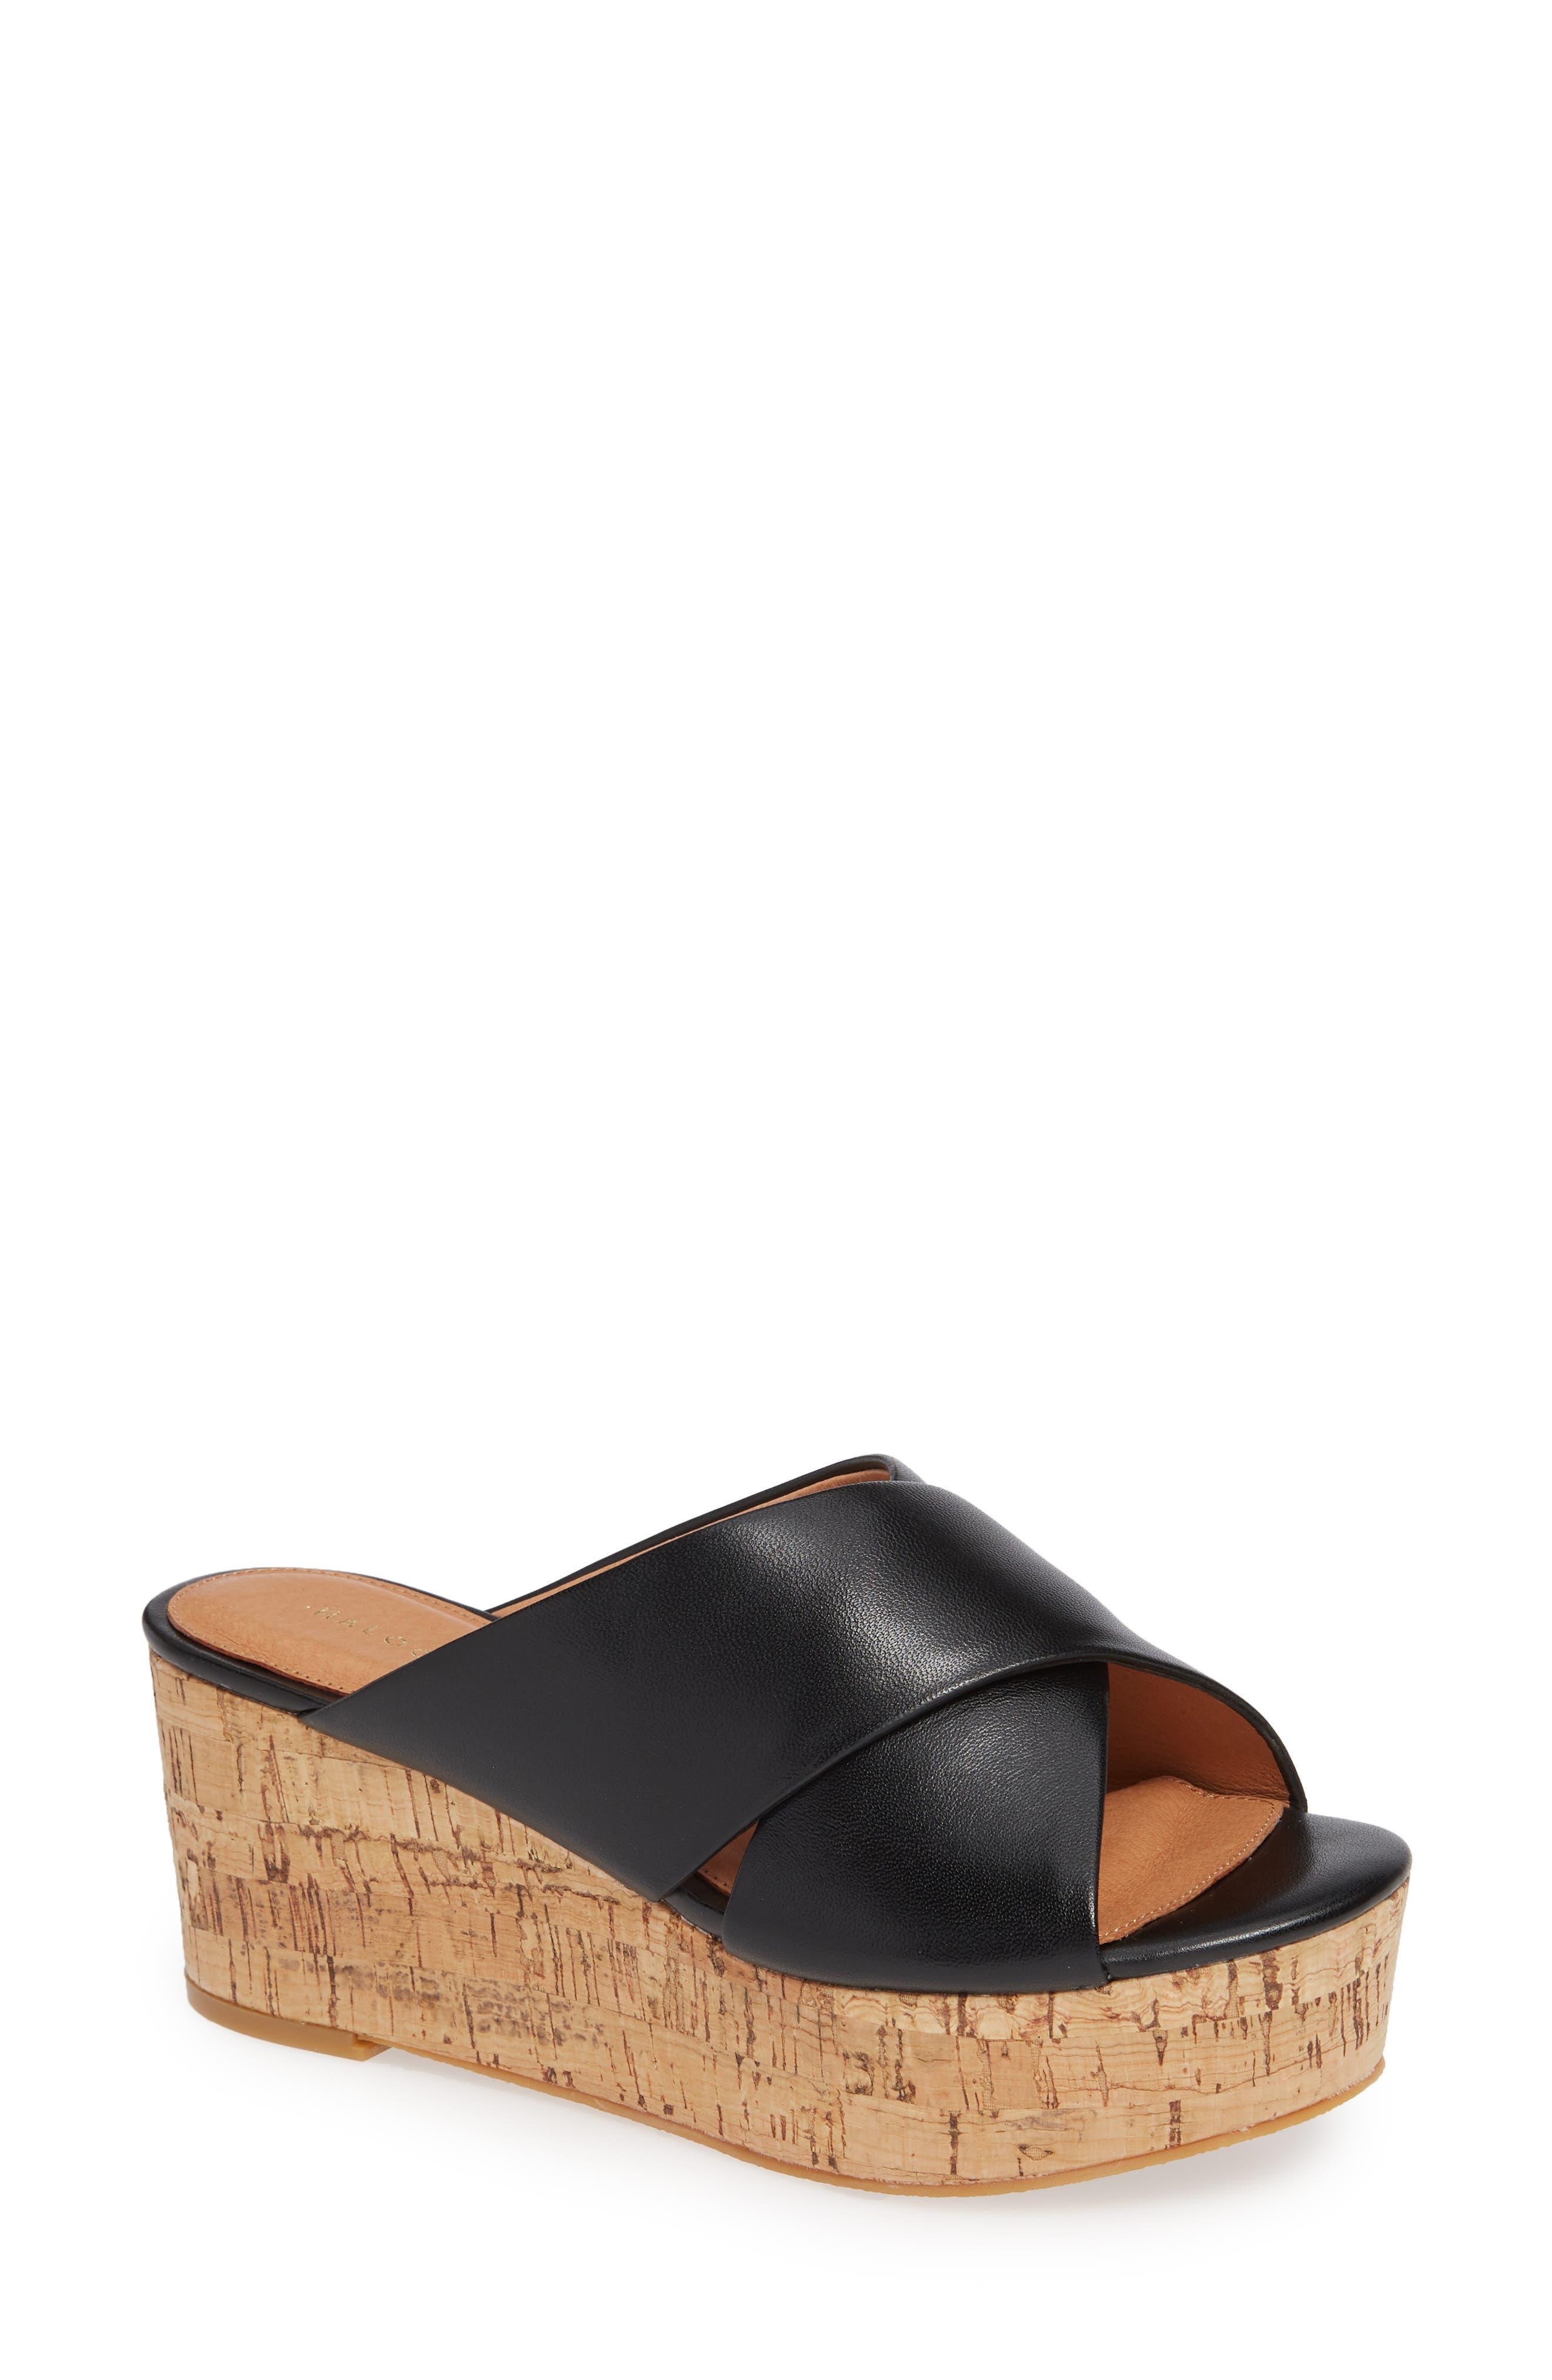 Elena Platform Wedge Sandal,                             Main thumbnail 1, color,                             BLACK LEATHER